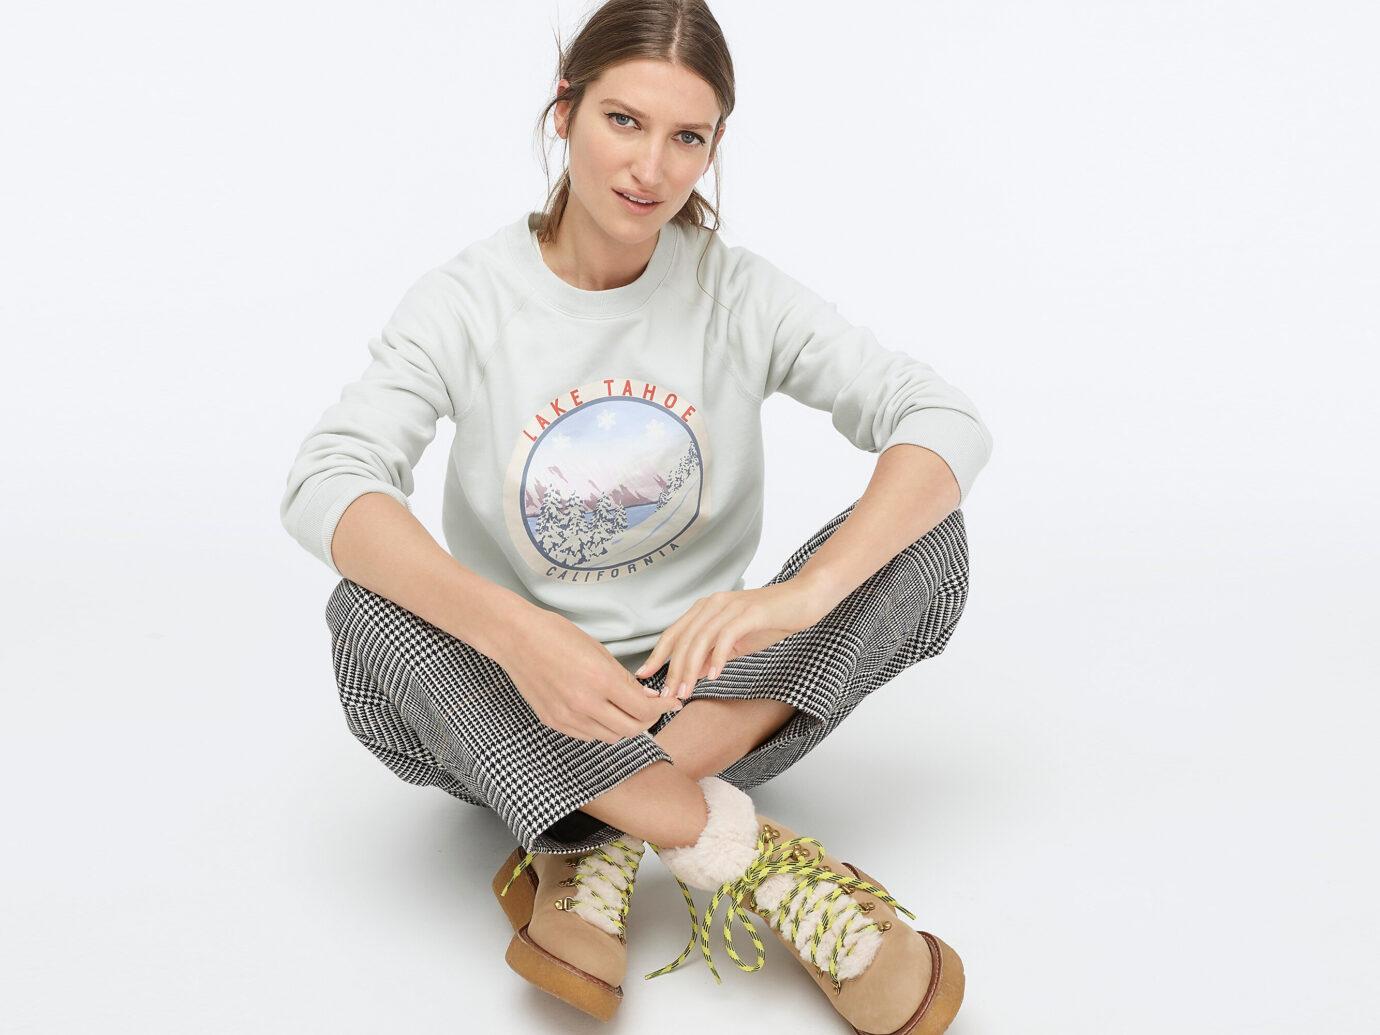 J.Crew Lake Tahoe Fleece Pullover Sweatshirt